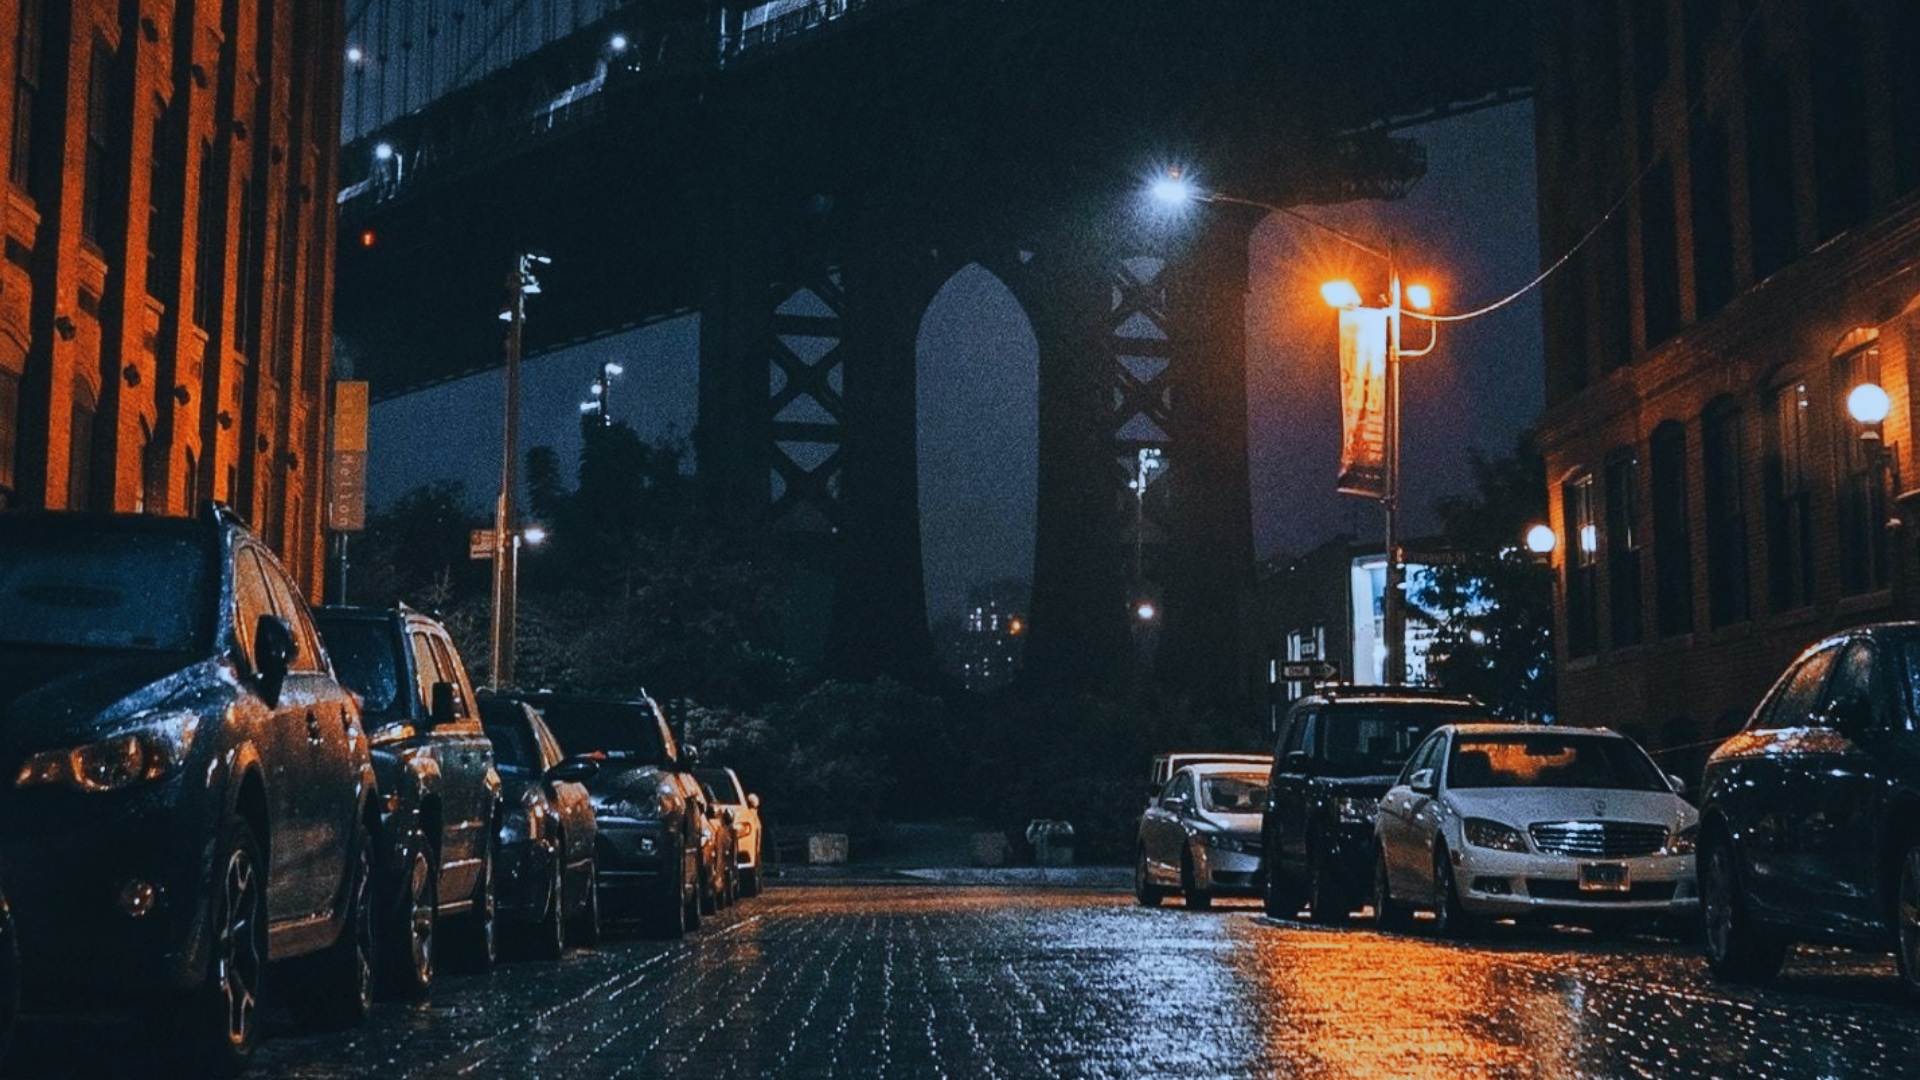 Car Night City Street USA New York City Manhattan Bridge 1920x1080